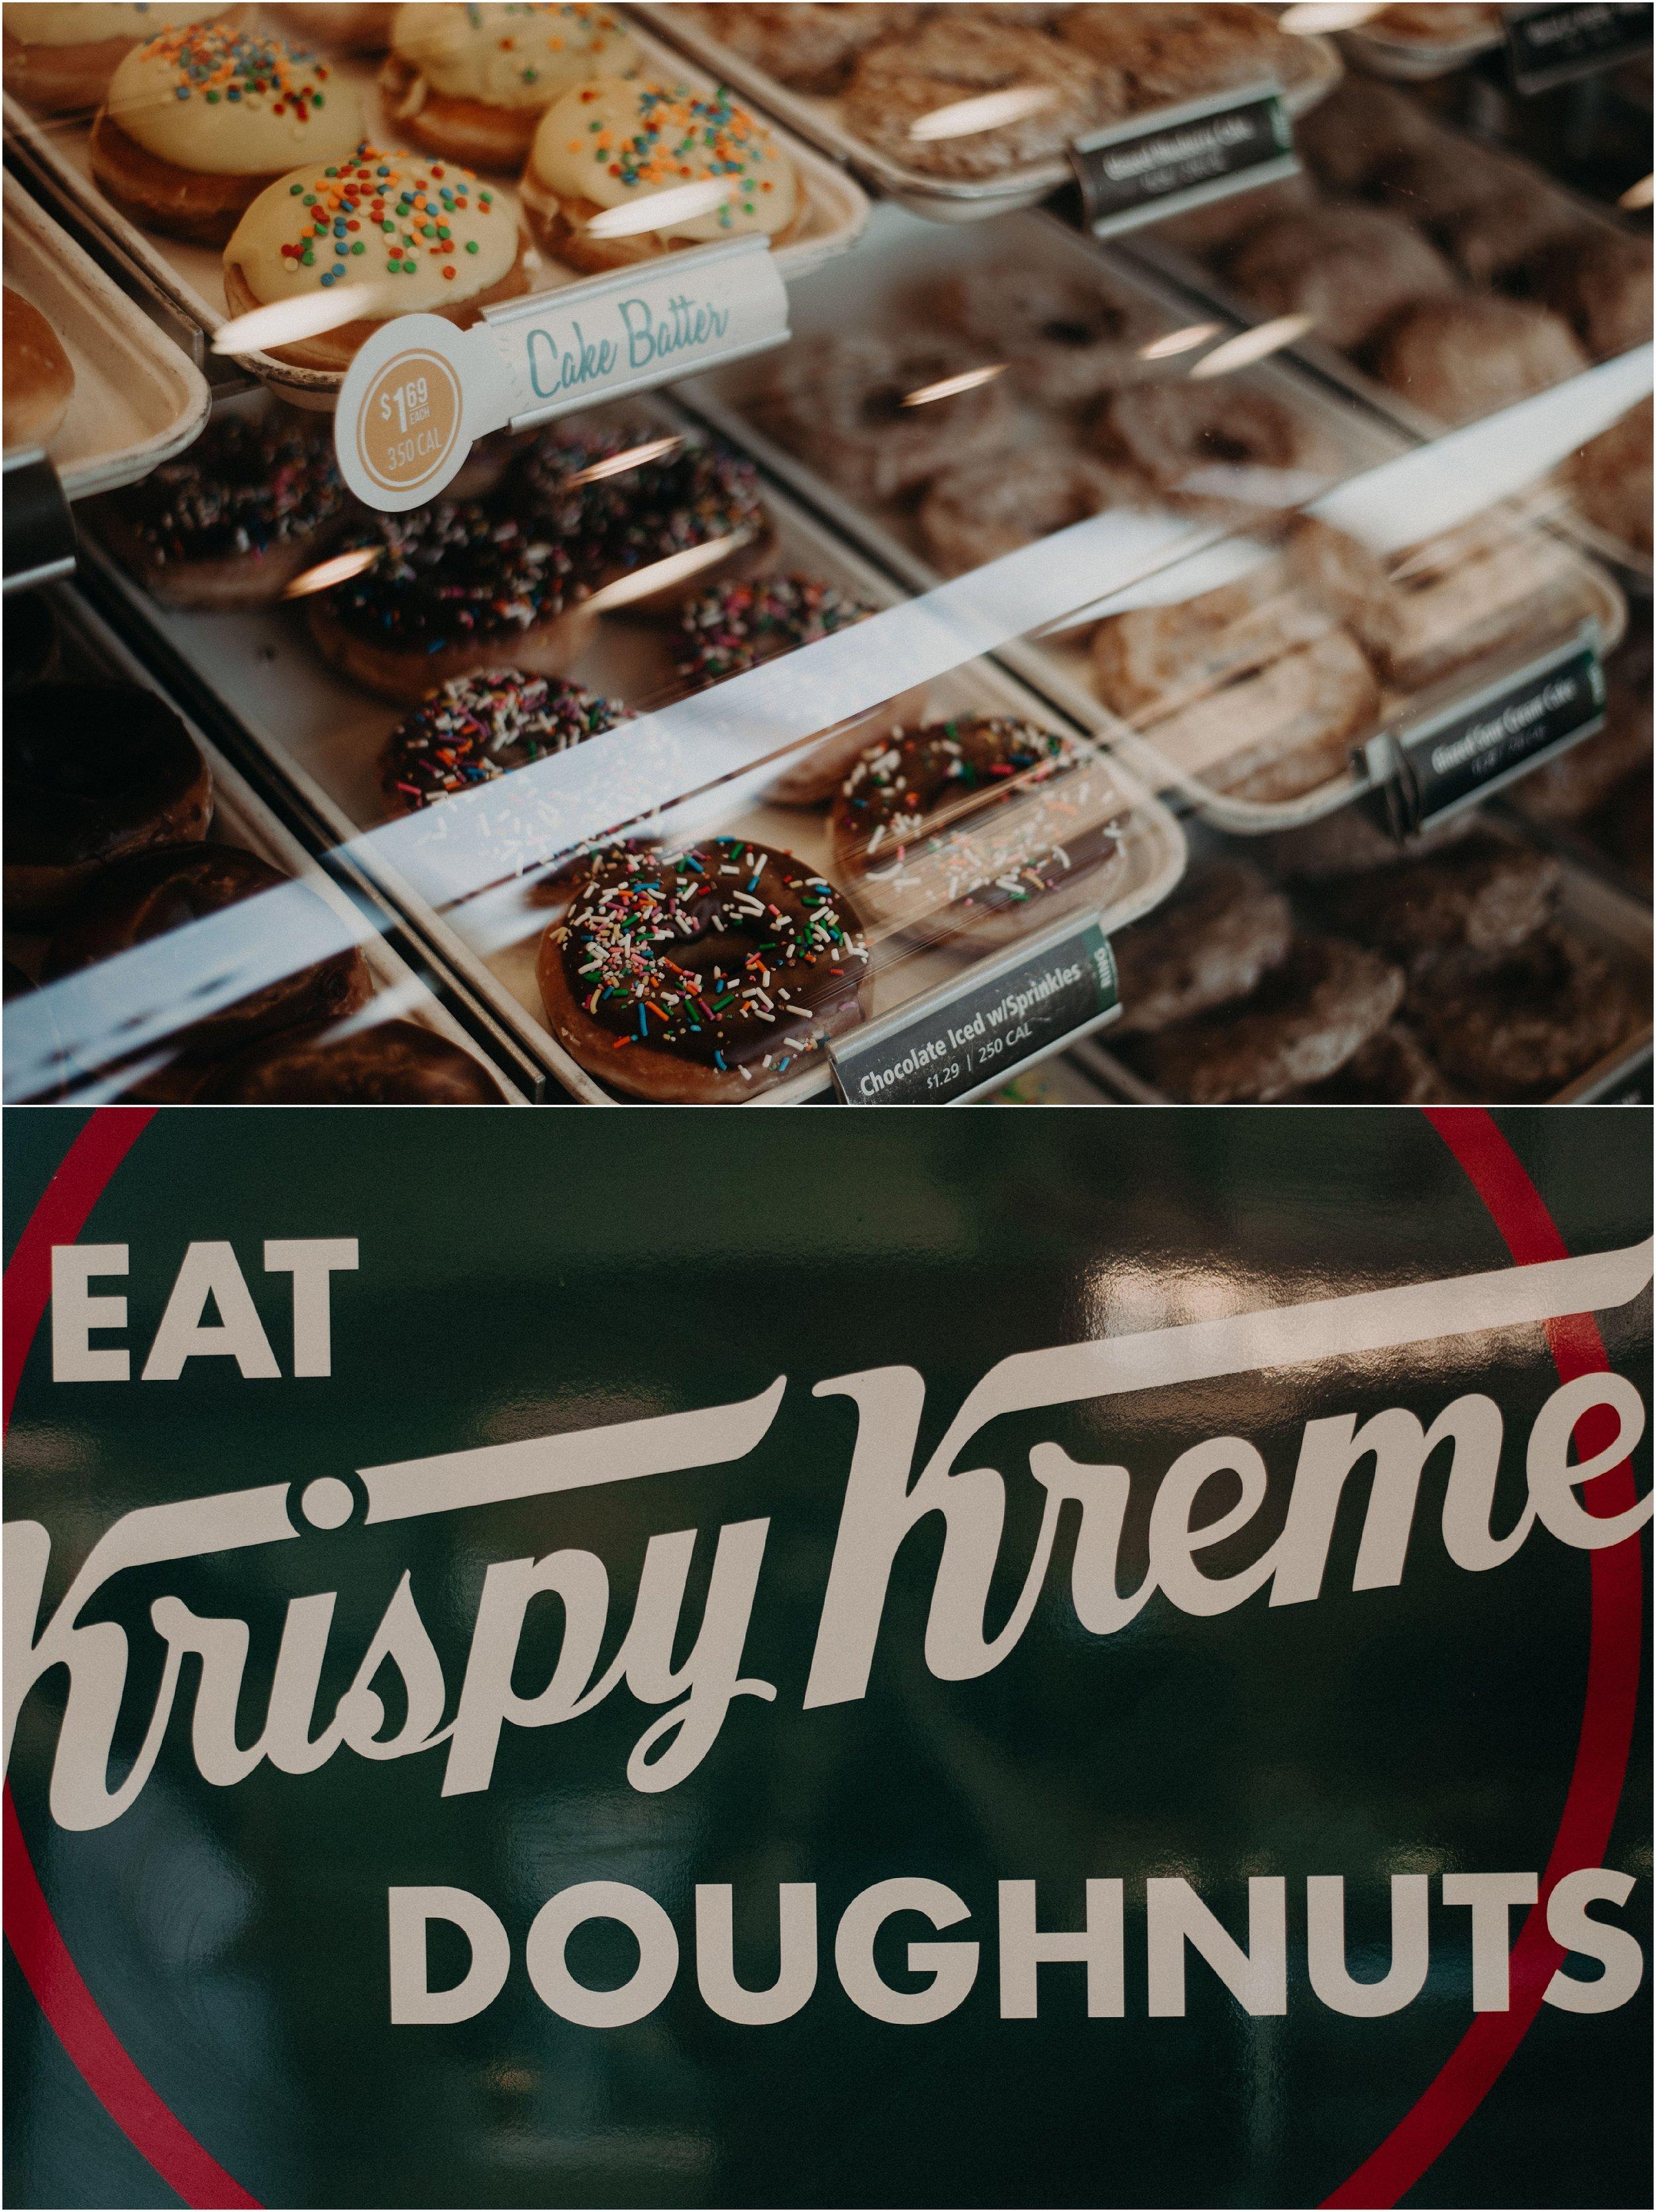 Eat Krispy Kreme Doughnuts in Chattanooga, Tennessee